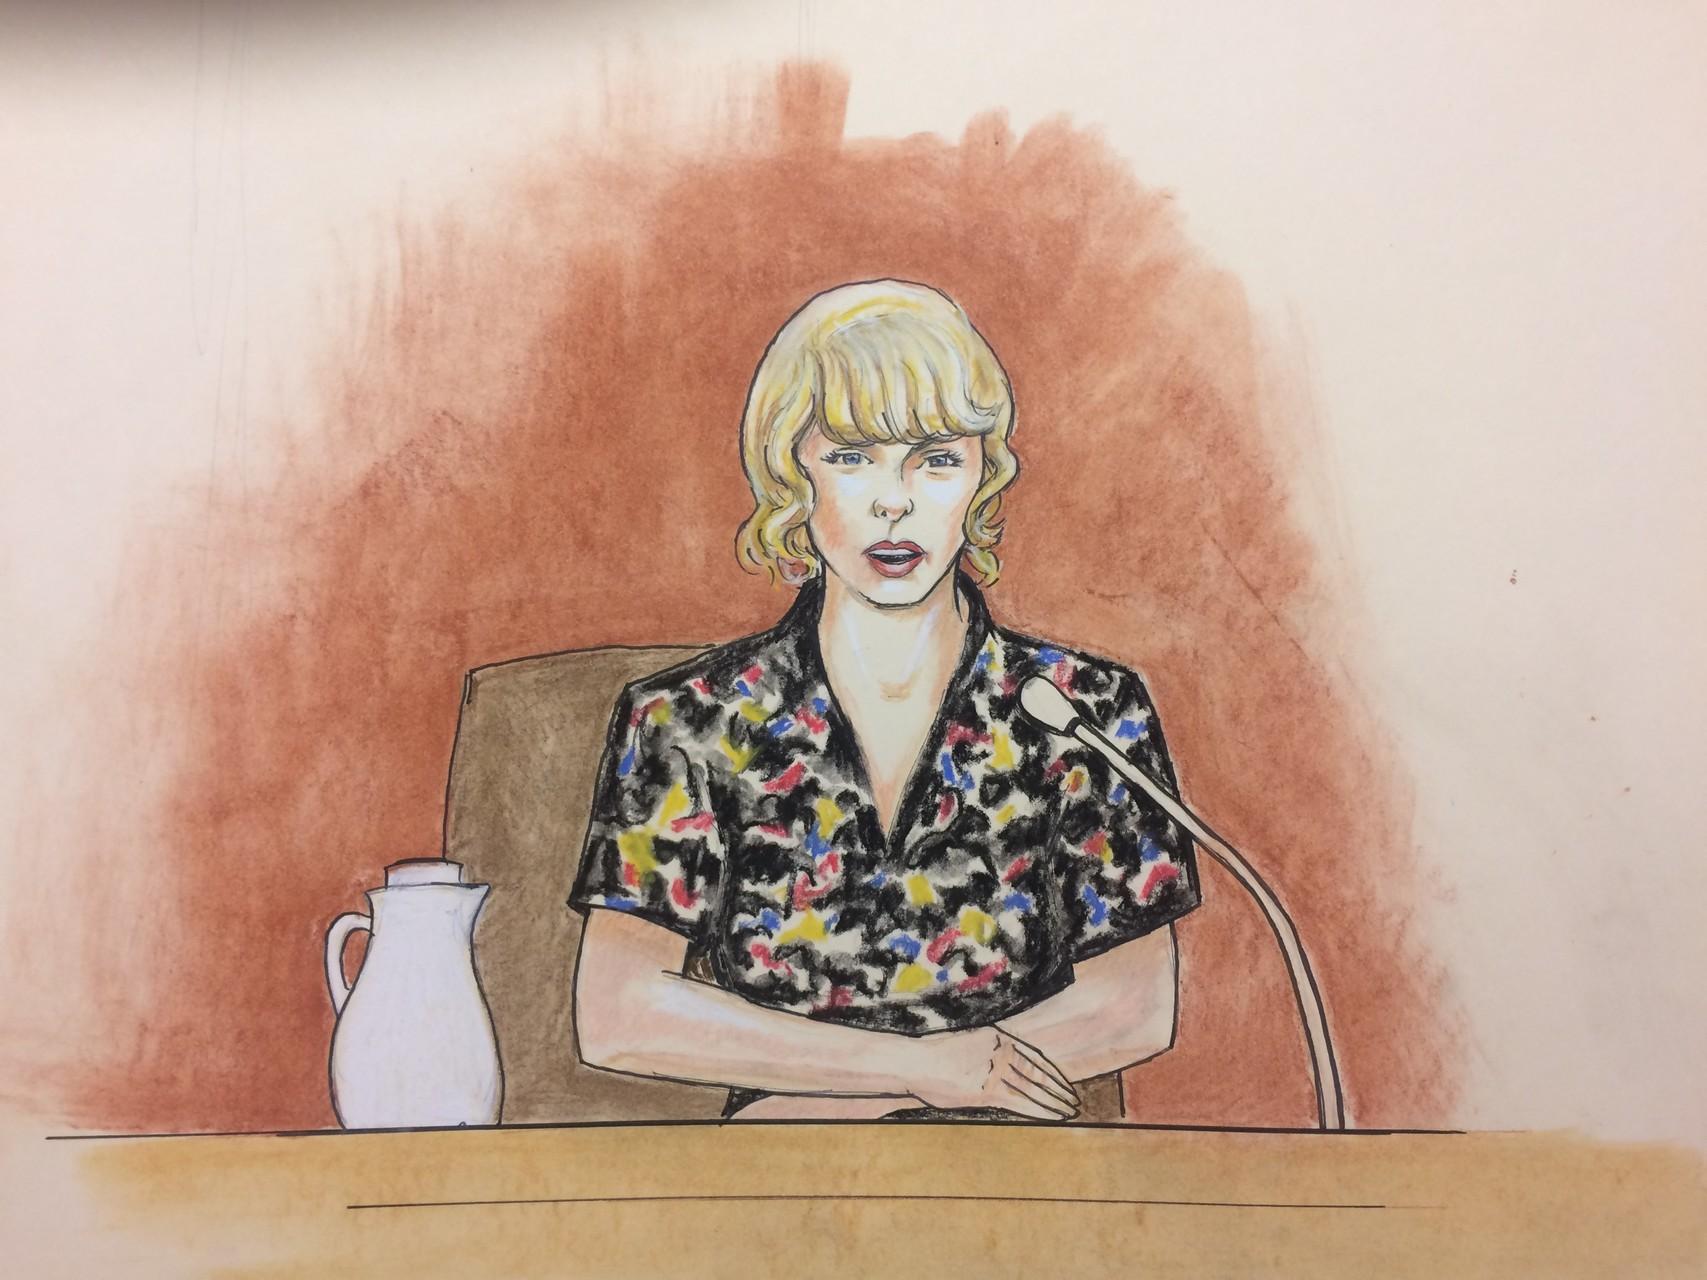 Taylor Swift Prevails As Judge Dismisses Dj S Groping Lawsuit Cbs News